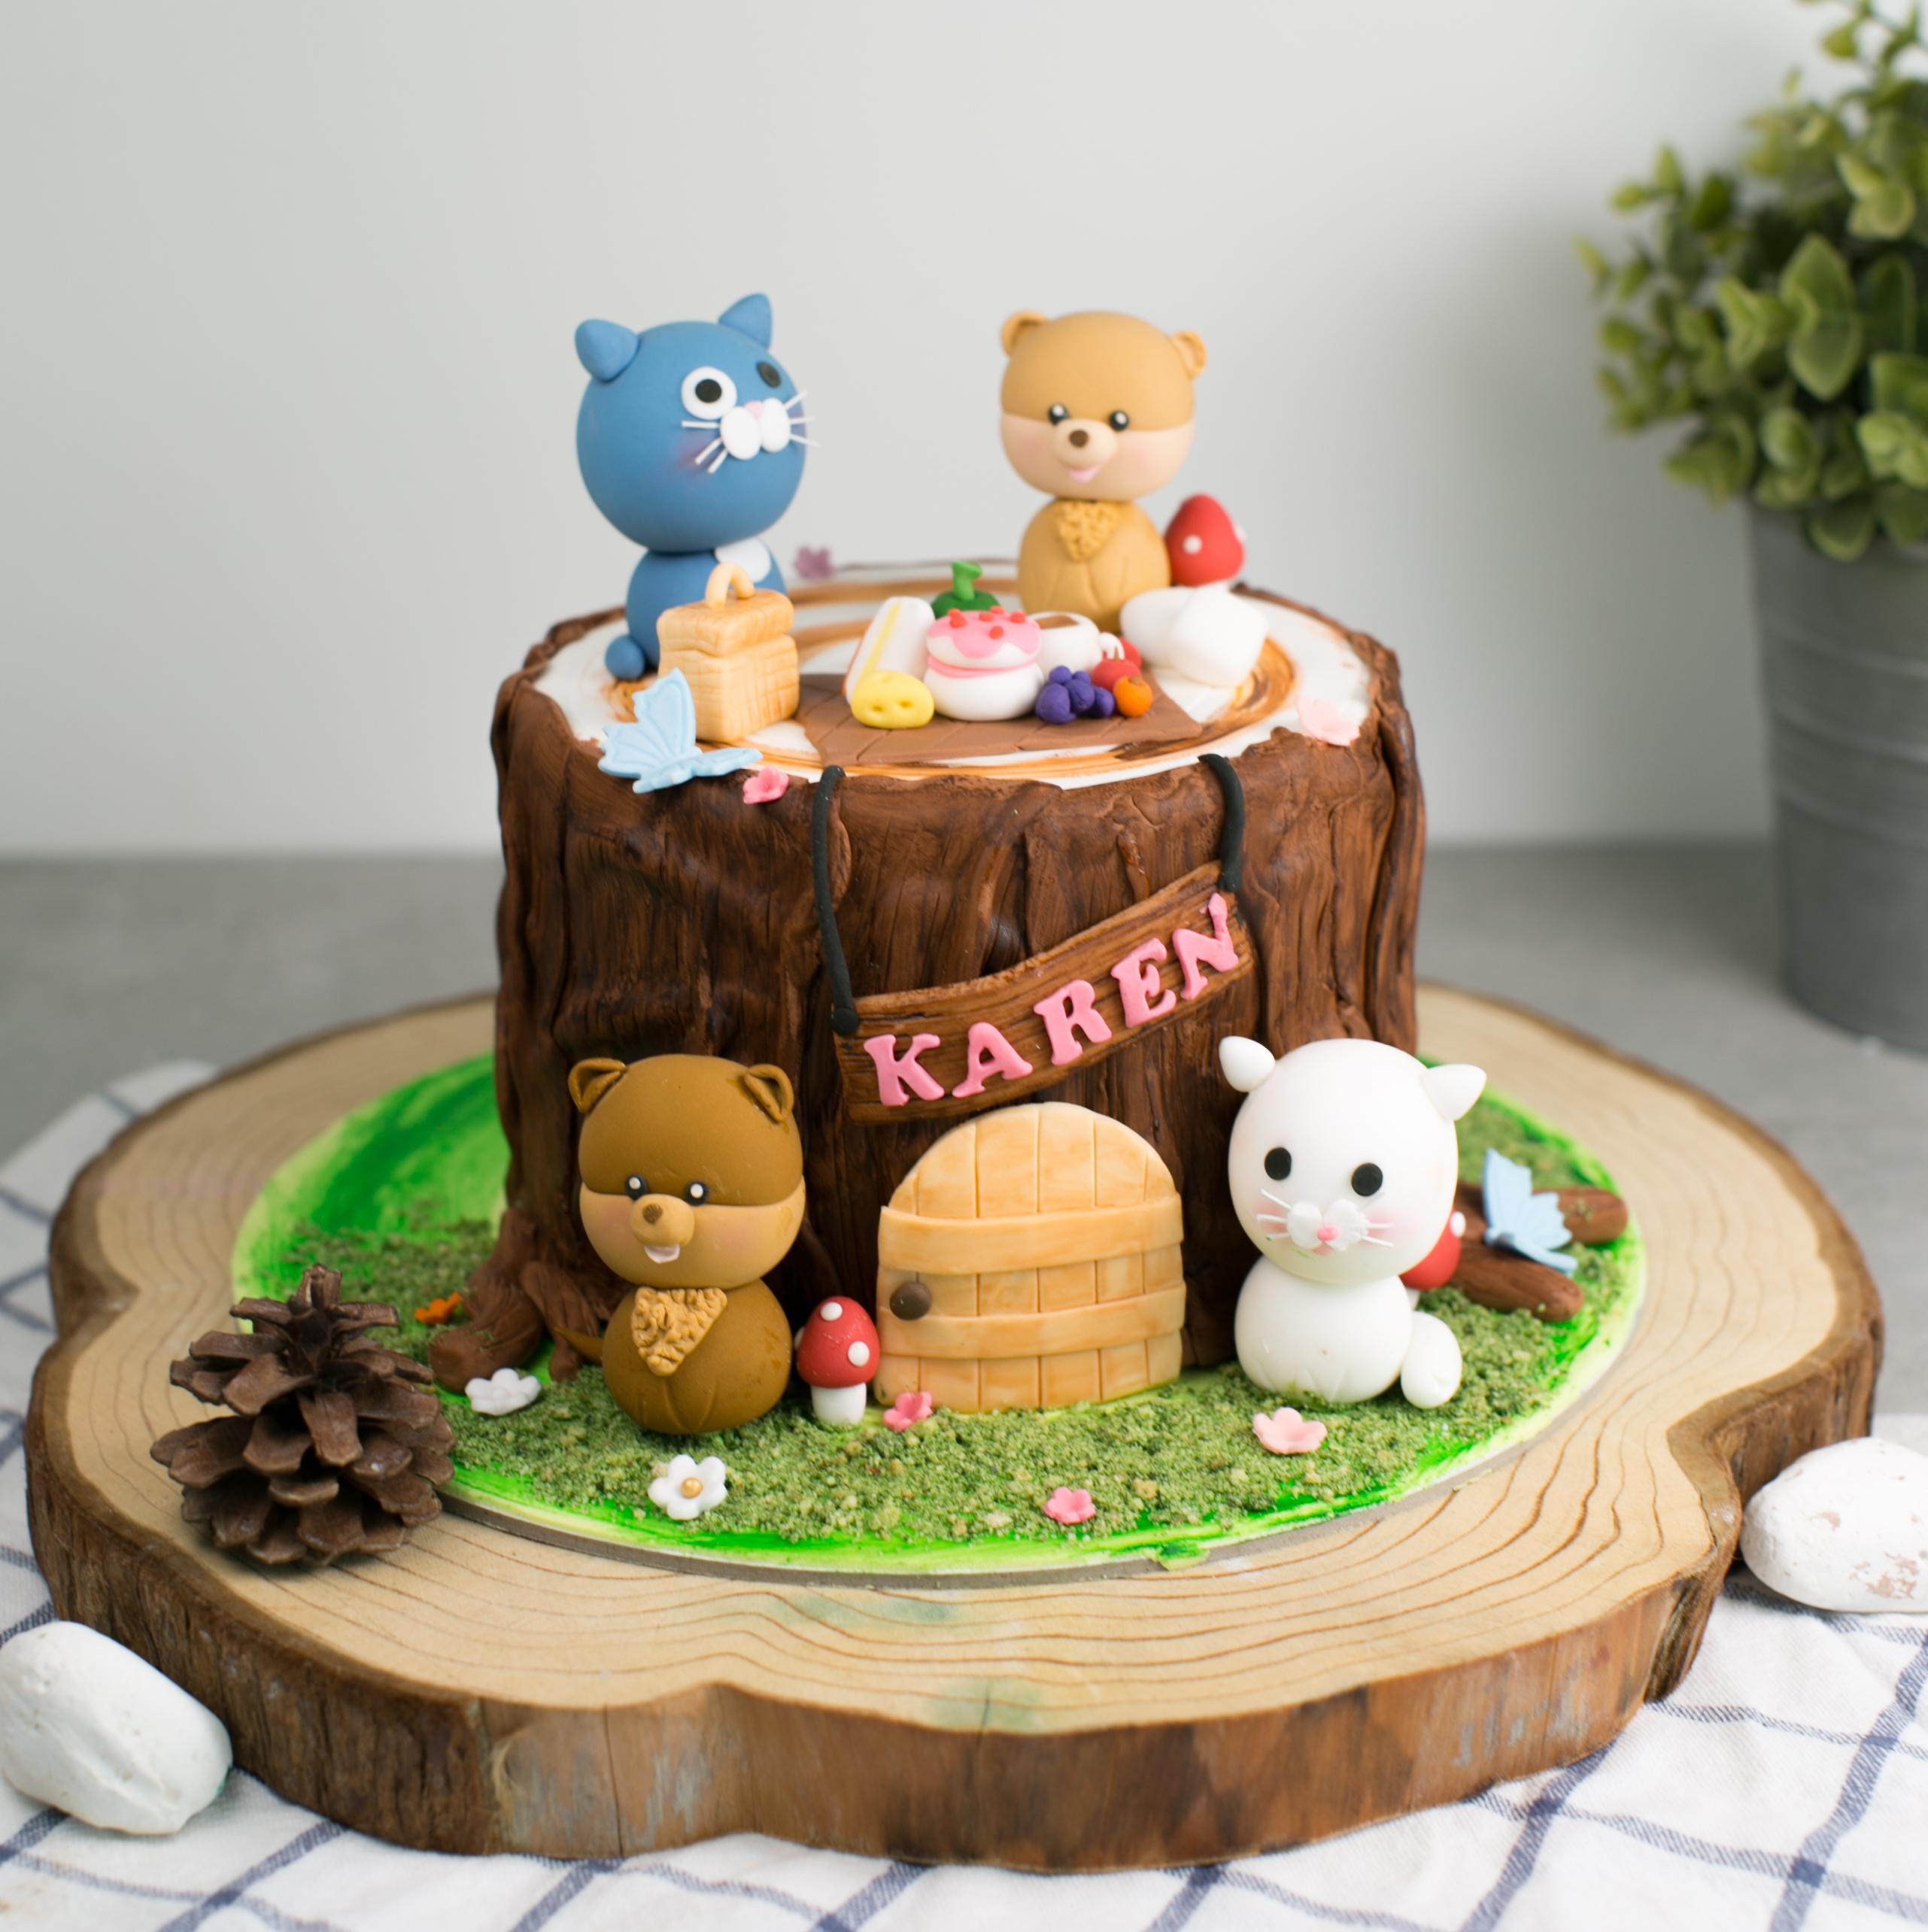 Kid's Birthday Cake - Baker's Brew | Singapore